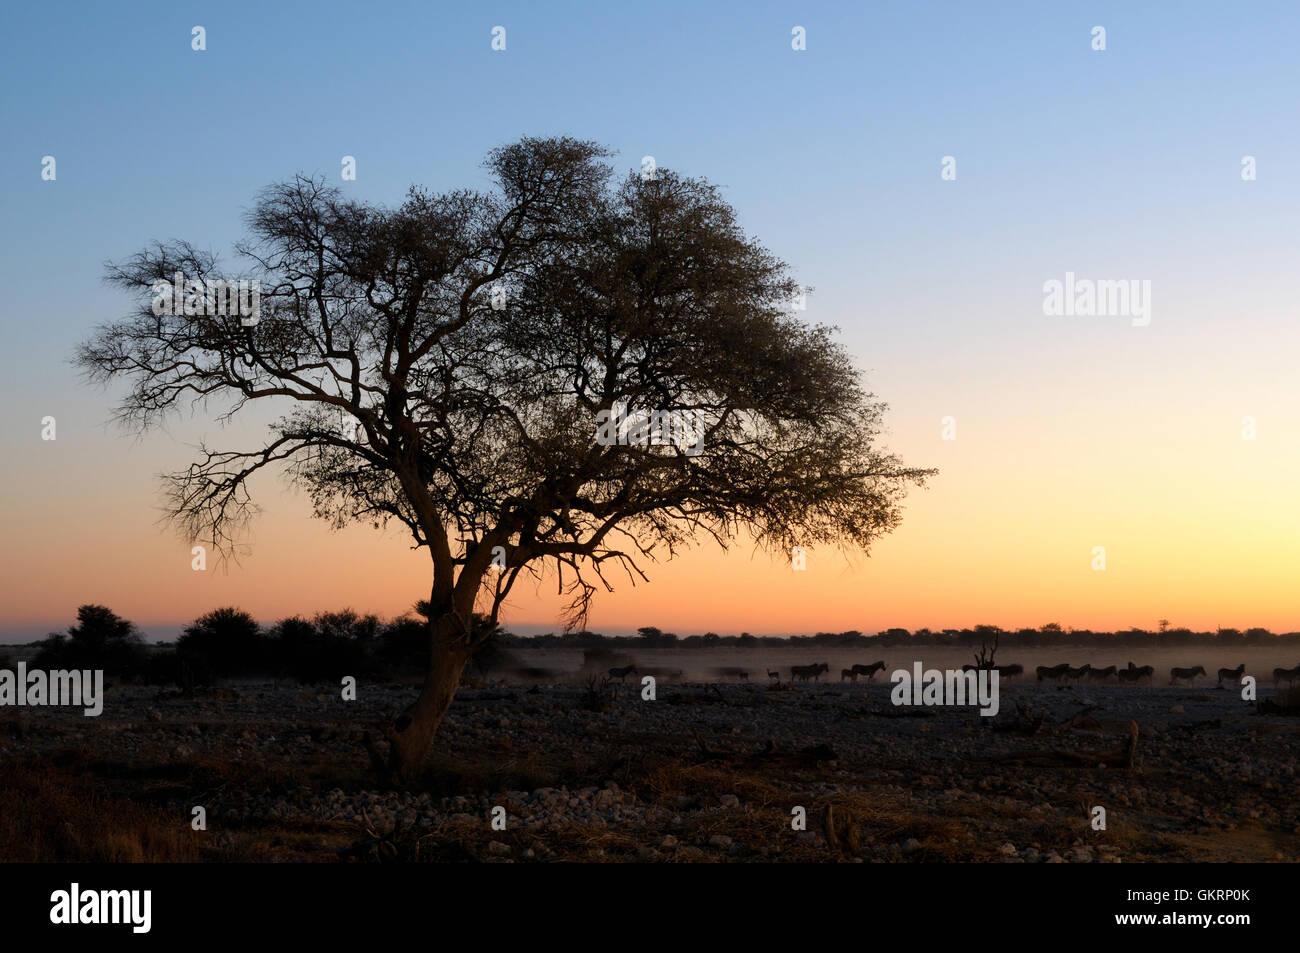 Sunset at the waterhole at the Okaukeujo Rest Camp, Etosha Natio - Stock Image